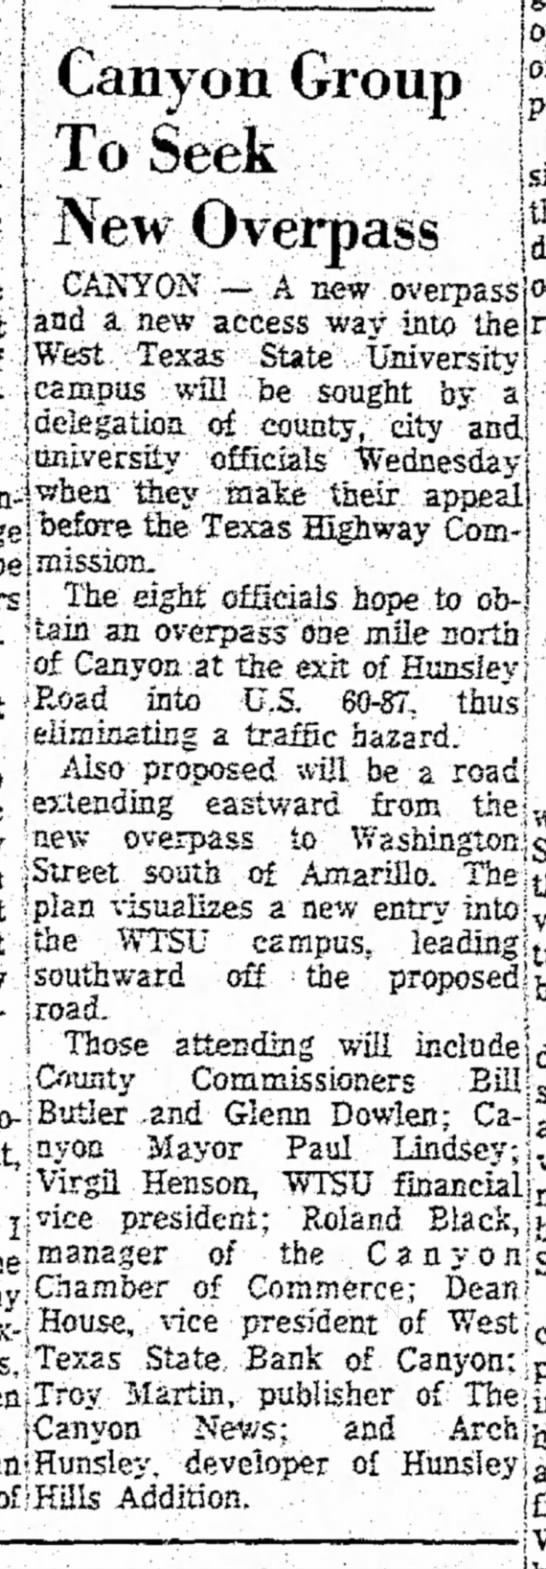 31 Mar 1970 Amarillo Globe-Times -